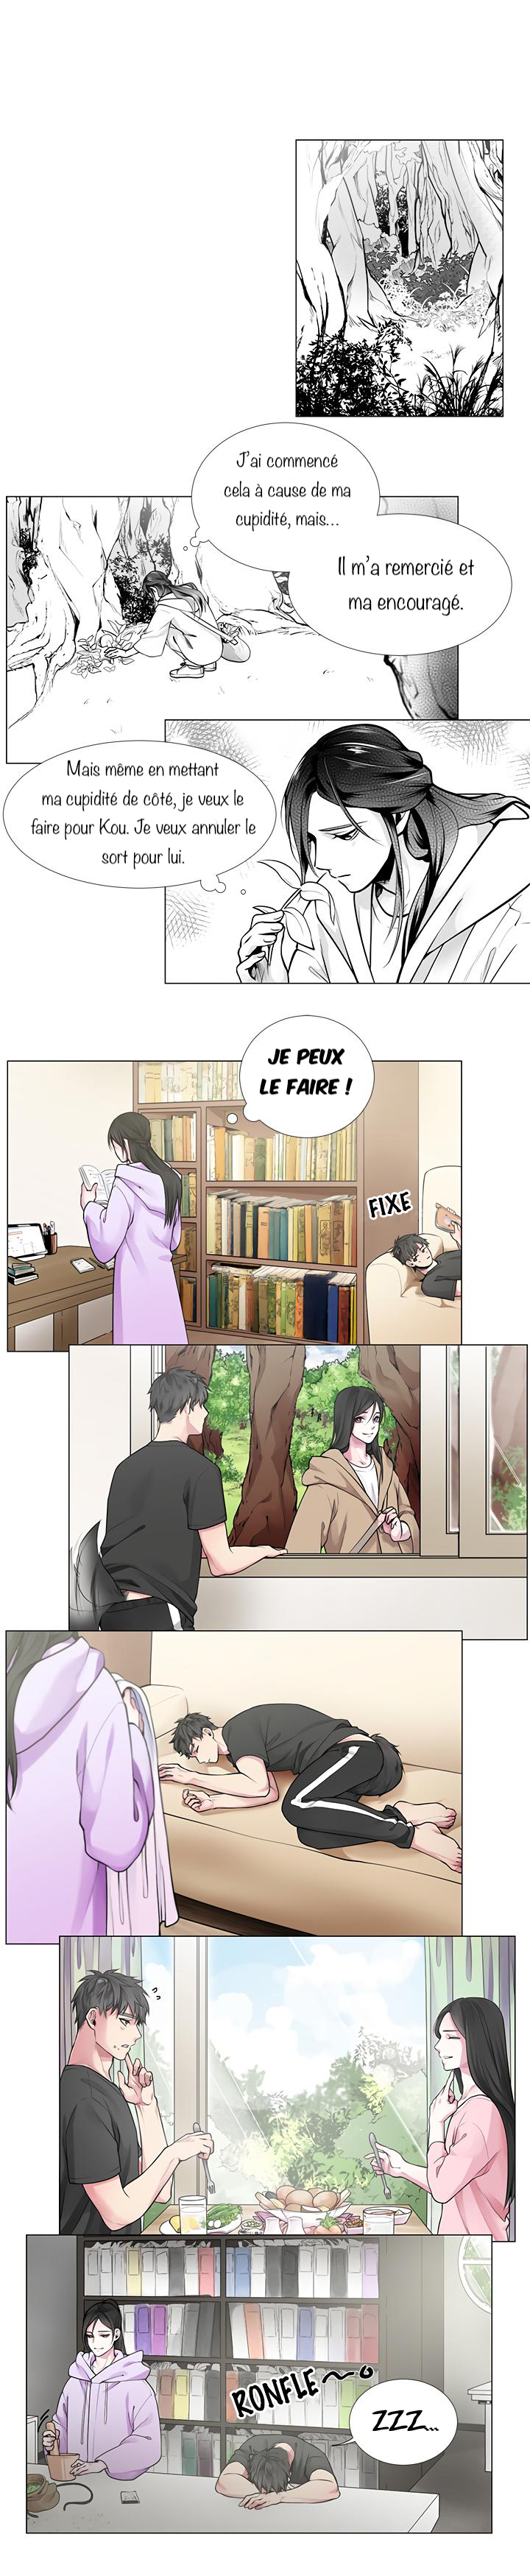 https://nine.mangadogs.com/fr_manga/pic2/59/11515/518618/71d055a94693c96c4b069593c5adc6e9.jpg Page 6